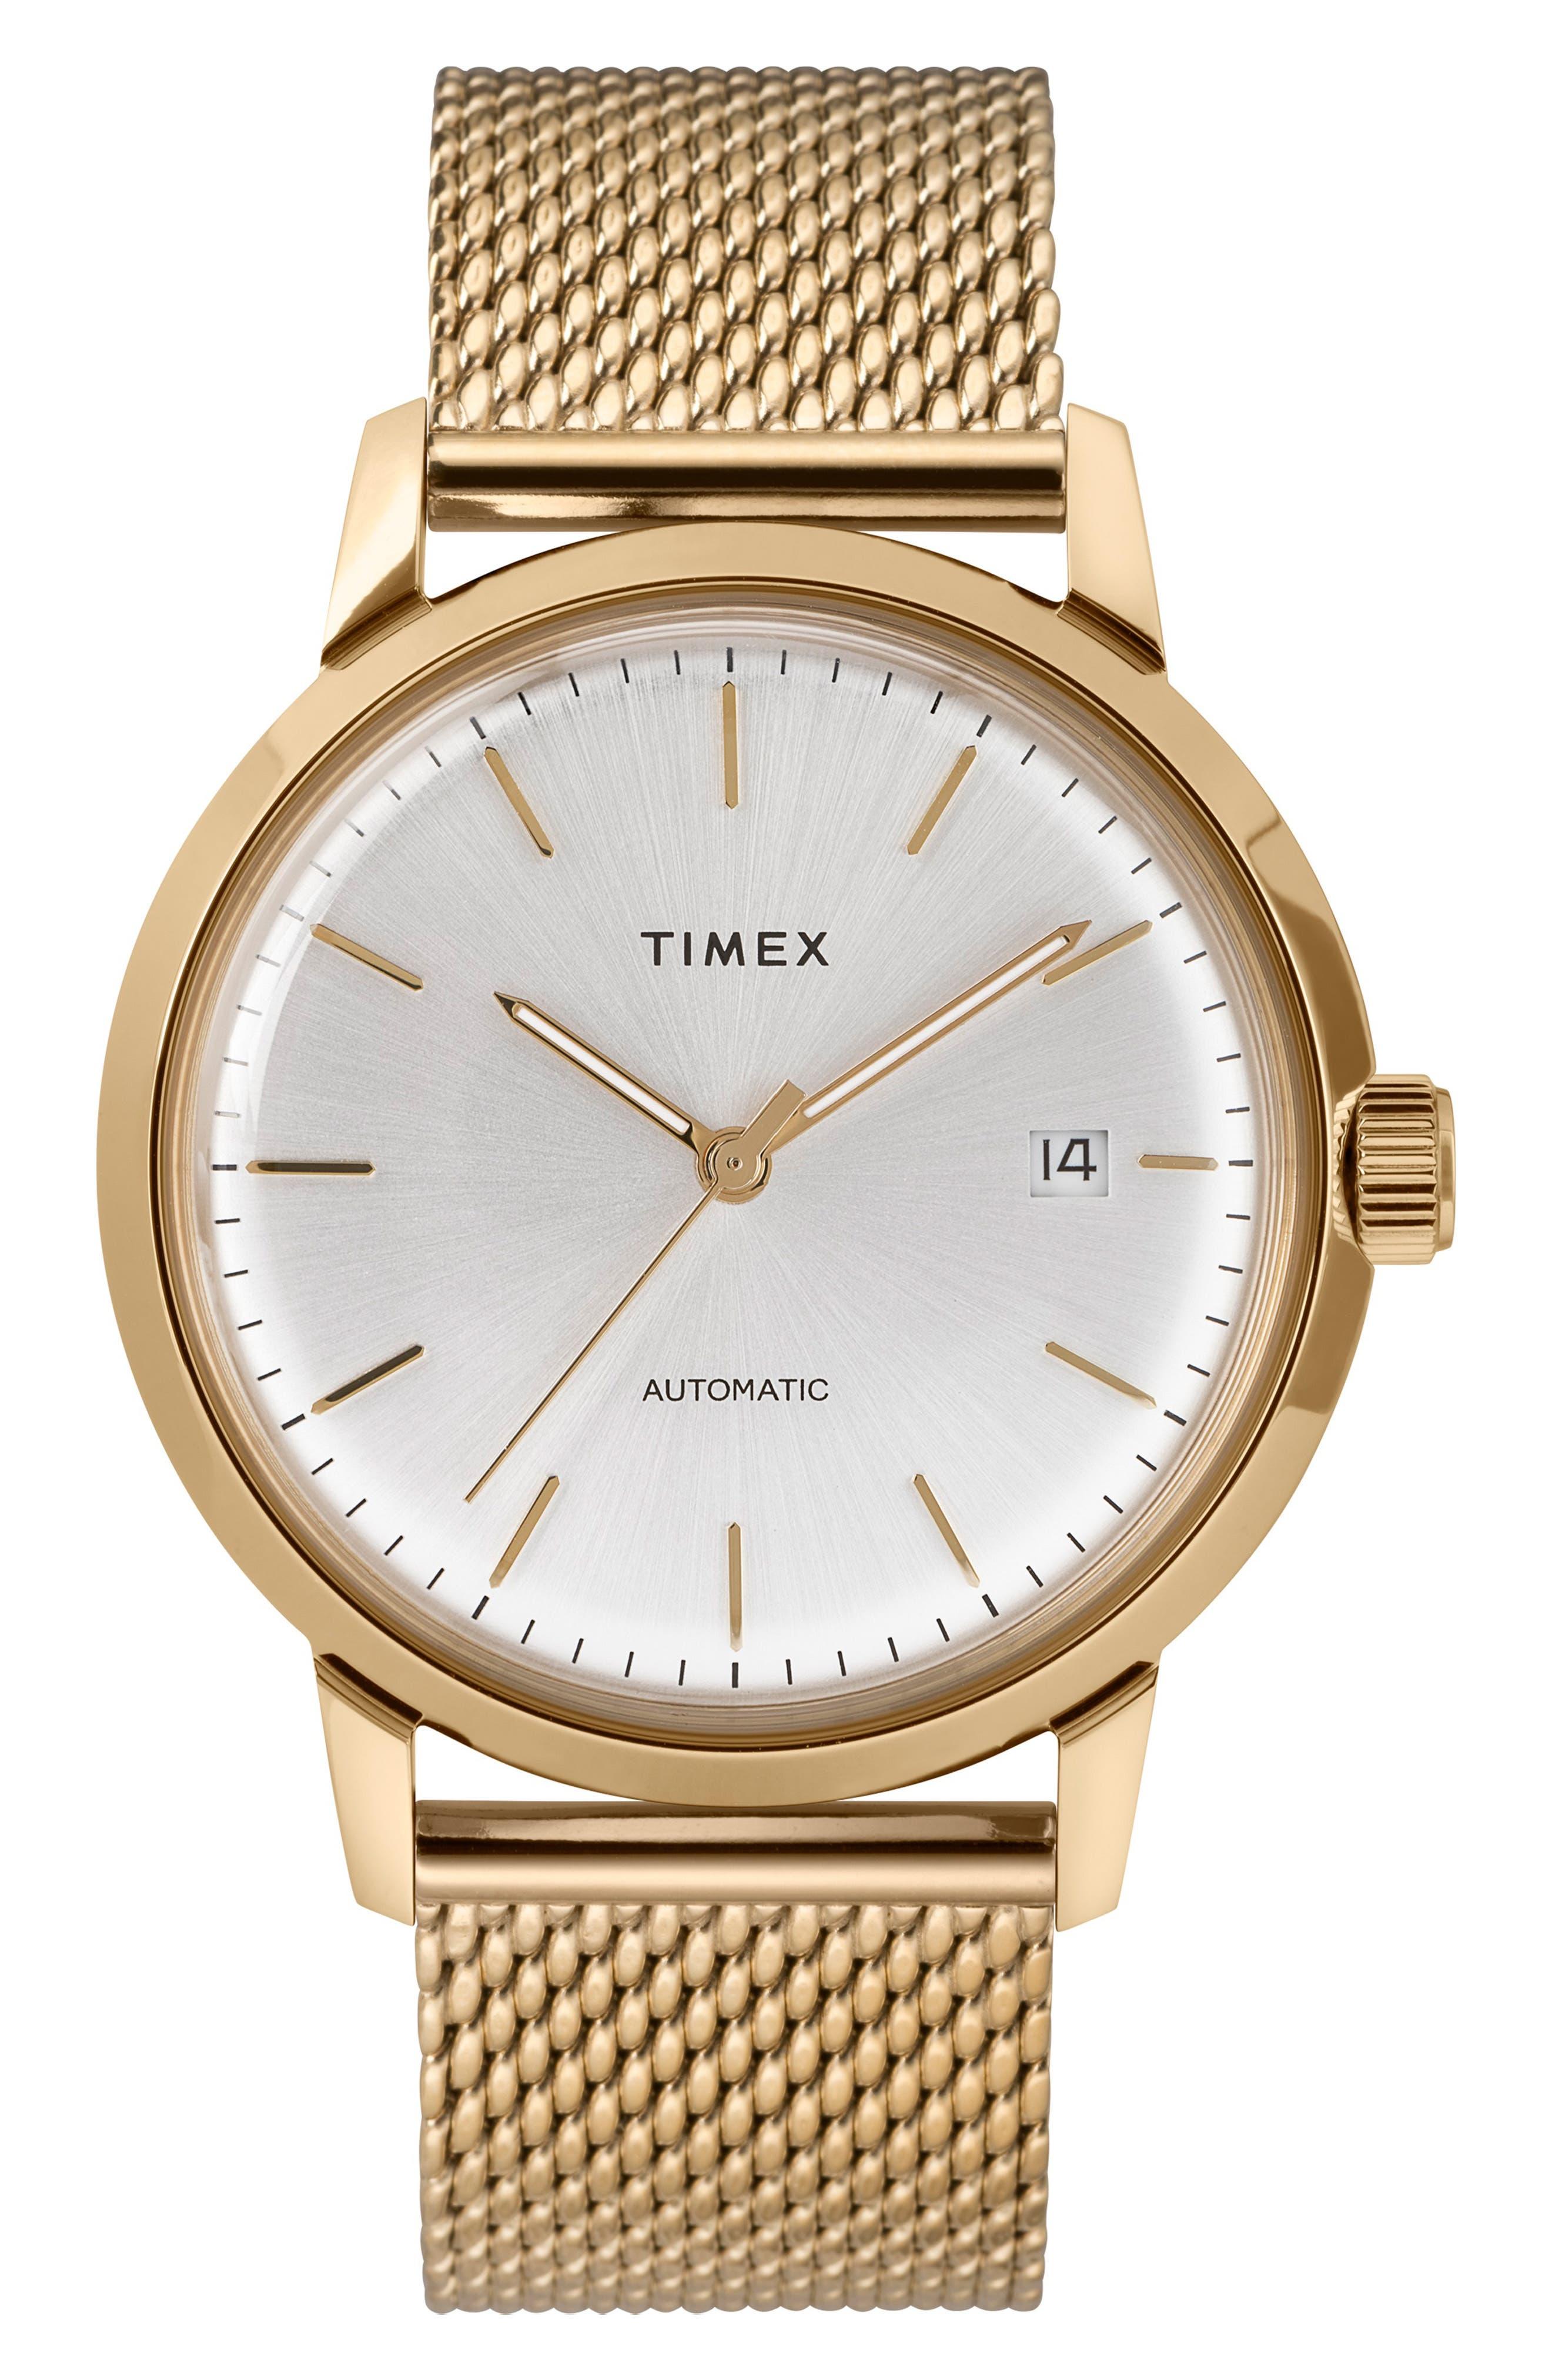 Timex Marlin Mesh Strap Automatic Watch, 40Mm